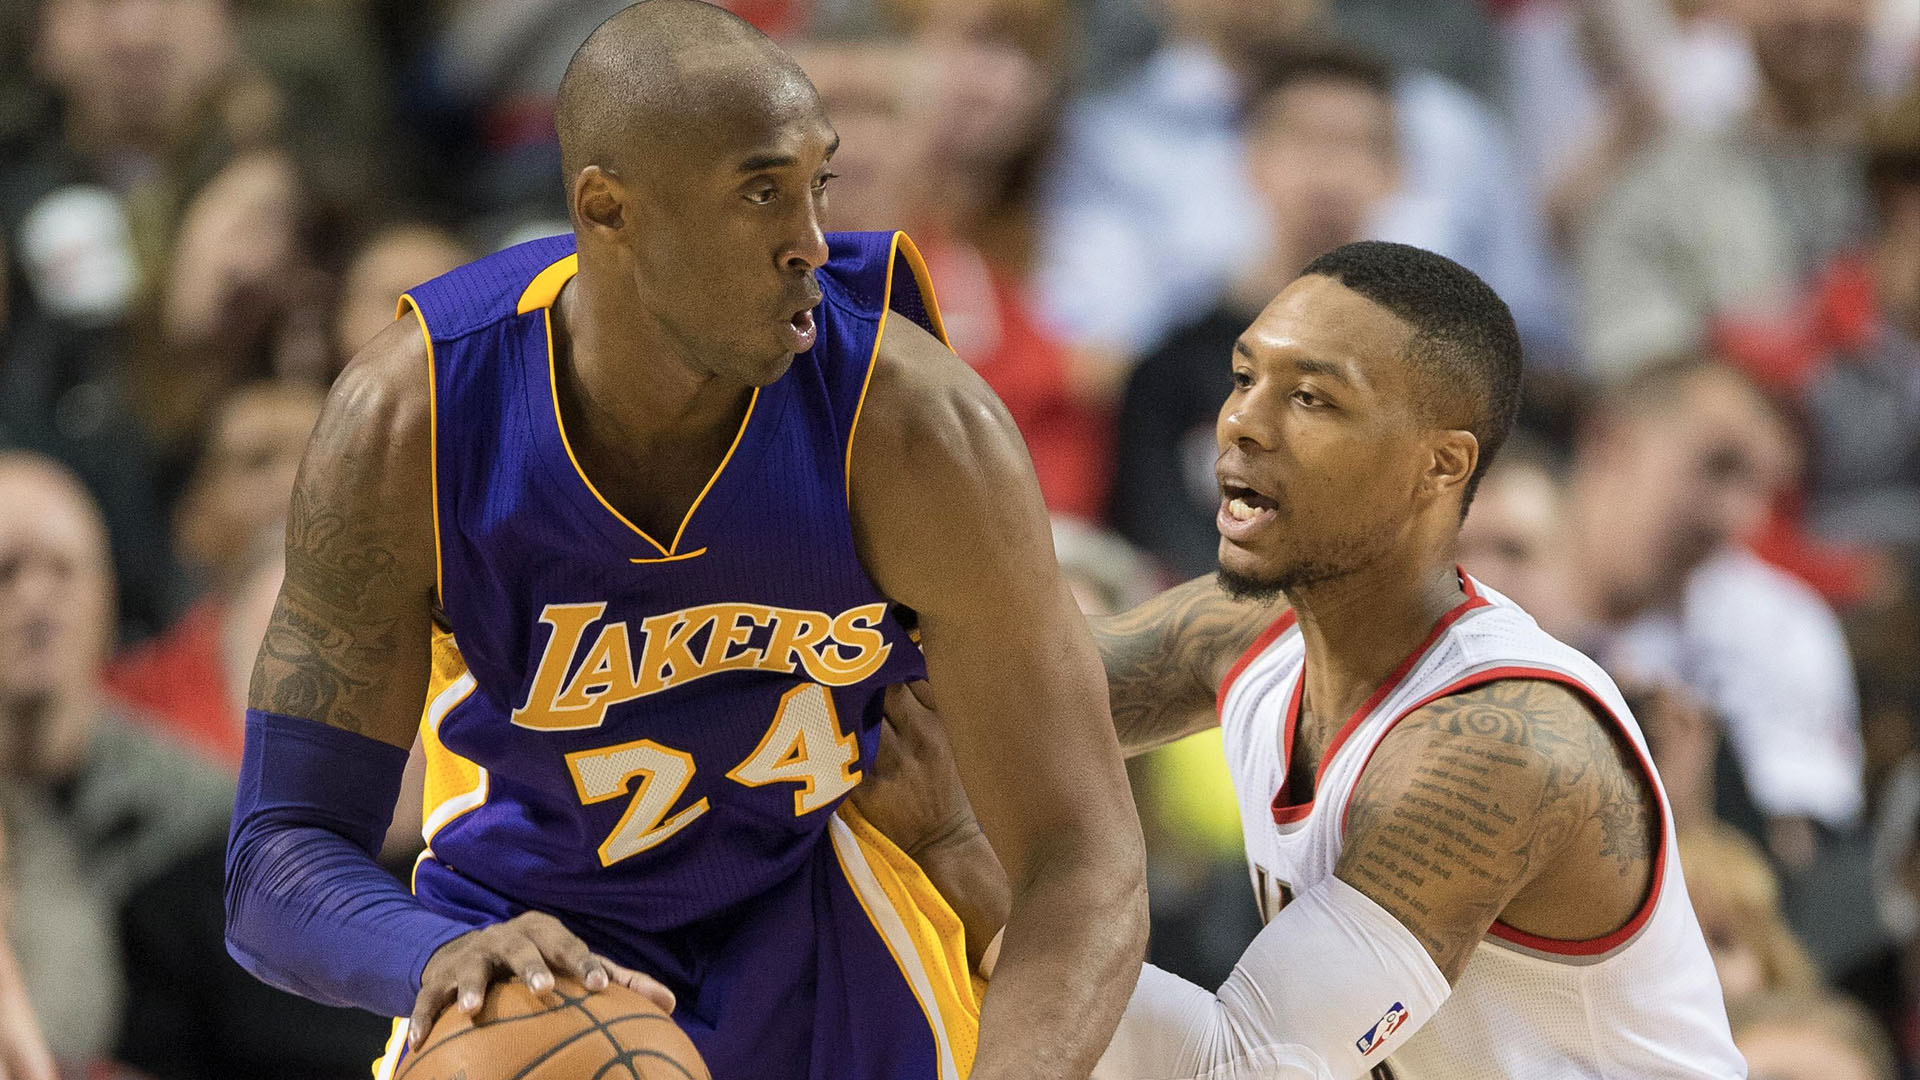 NBA Lillard Kobe Bryant